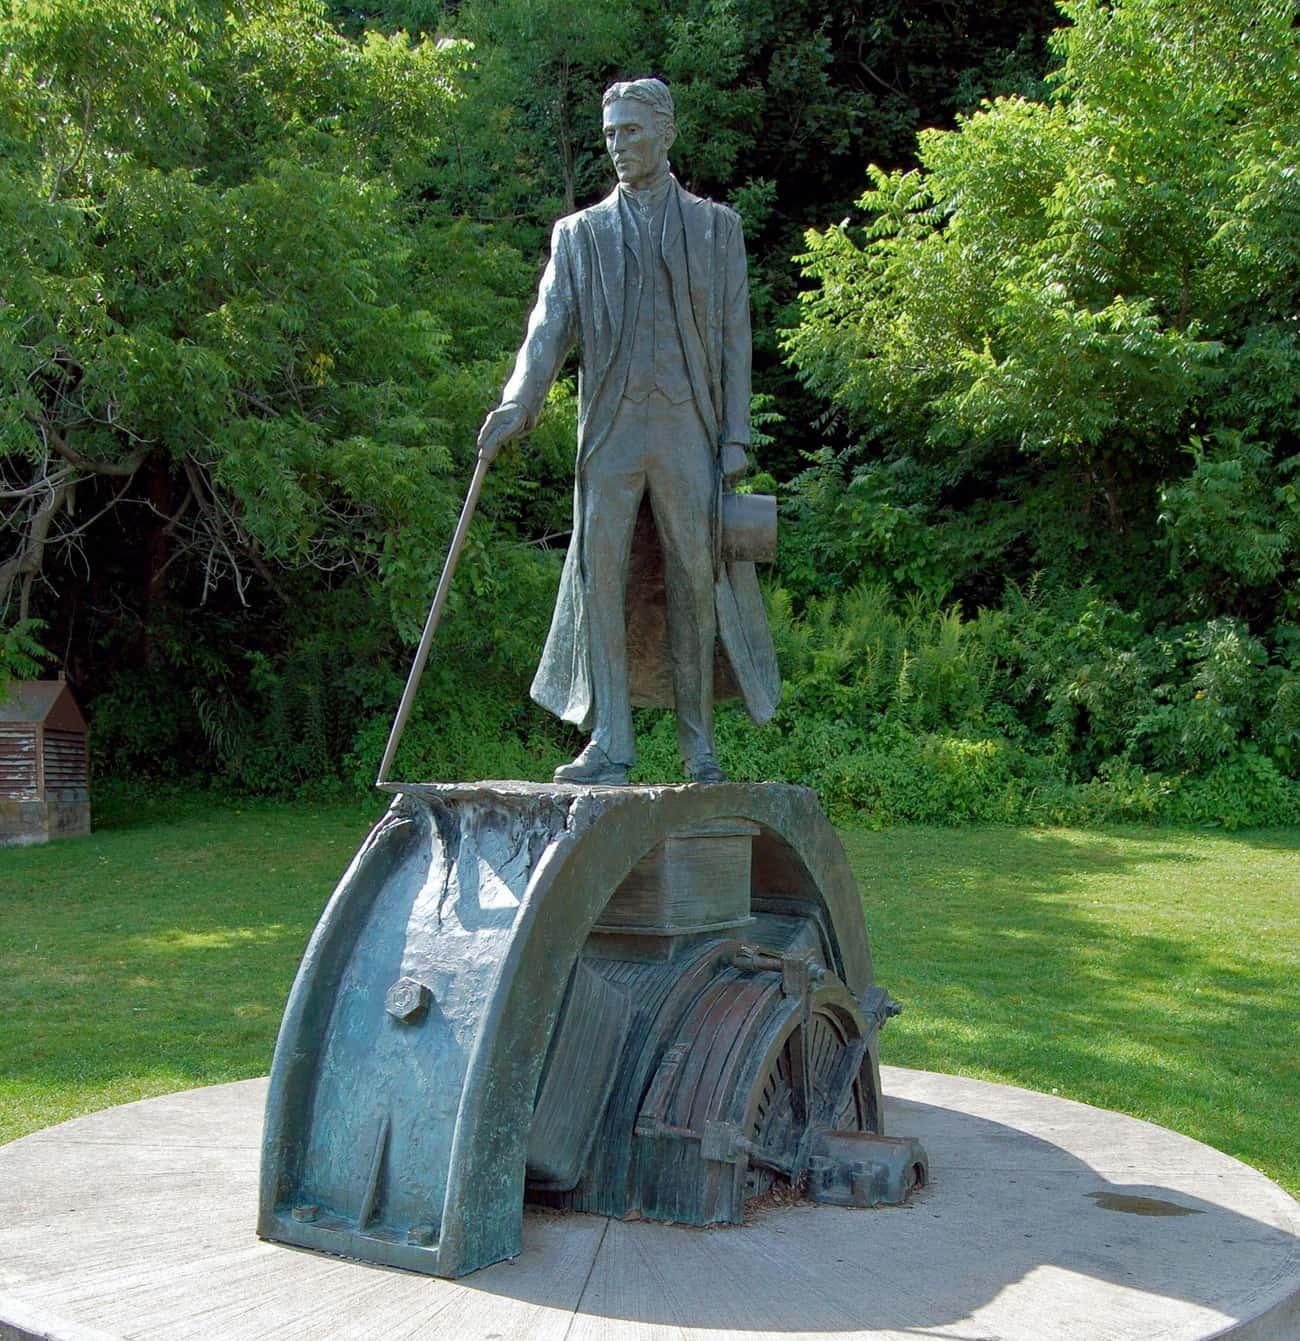 Tesla Wanted To Use Niagara Falls To Power The World